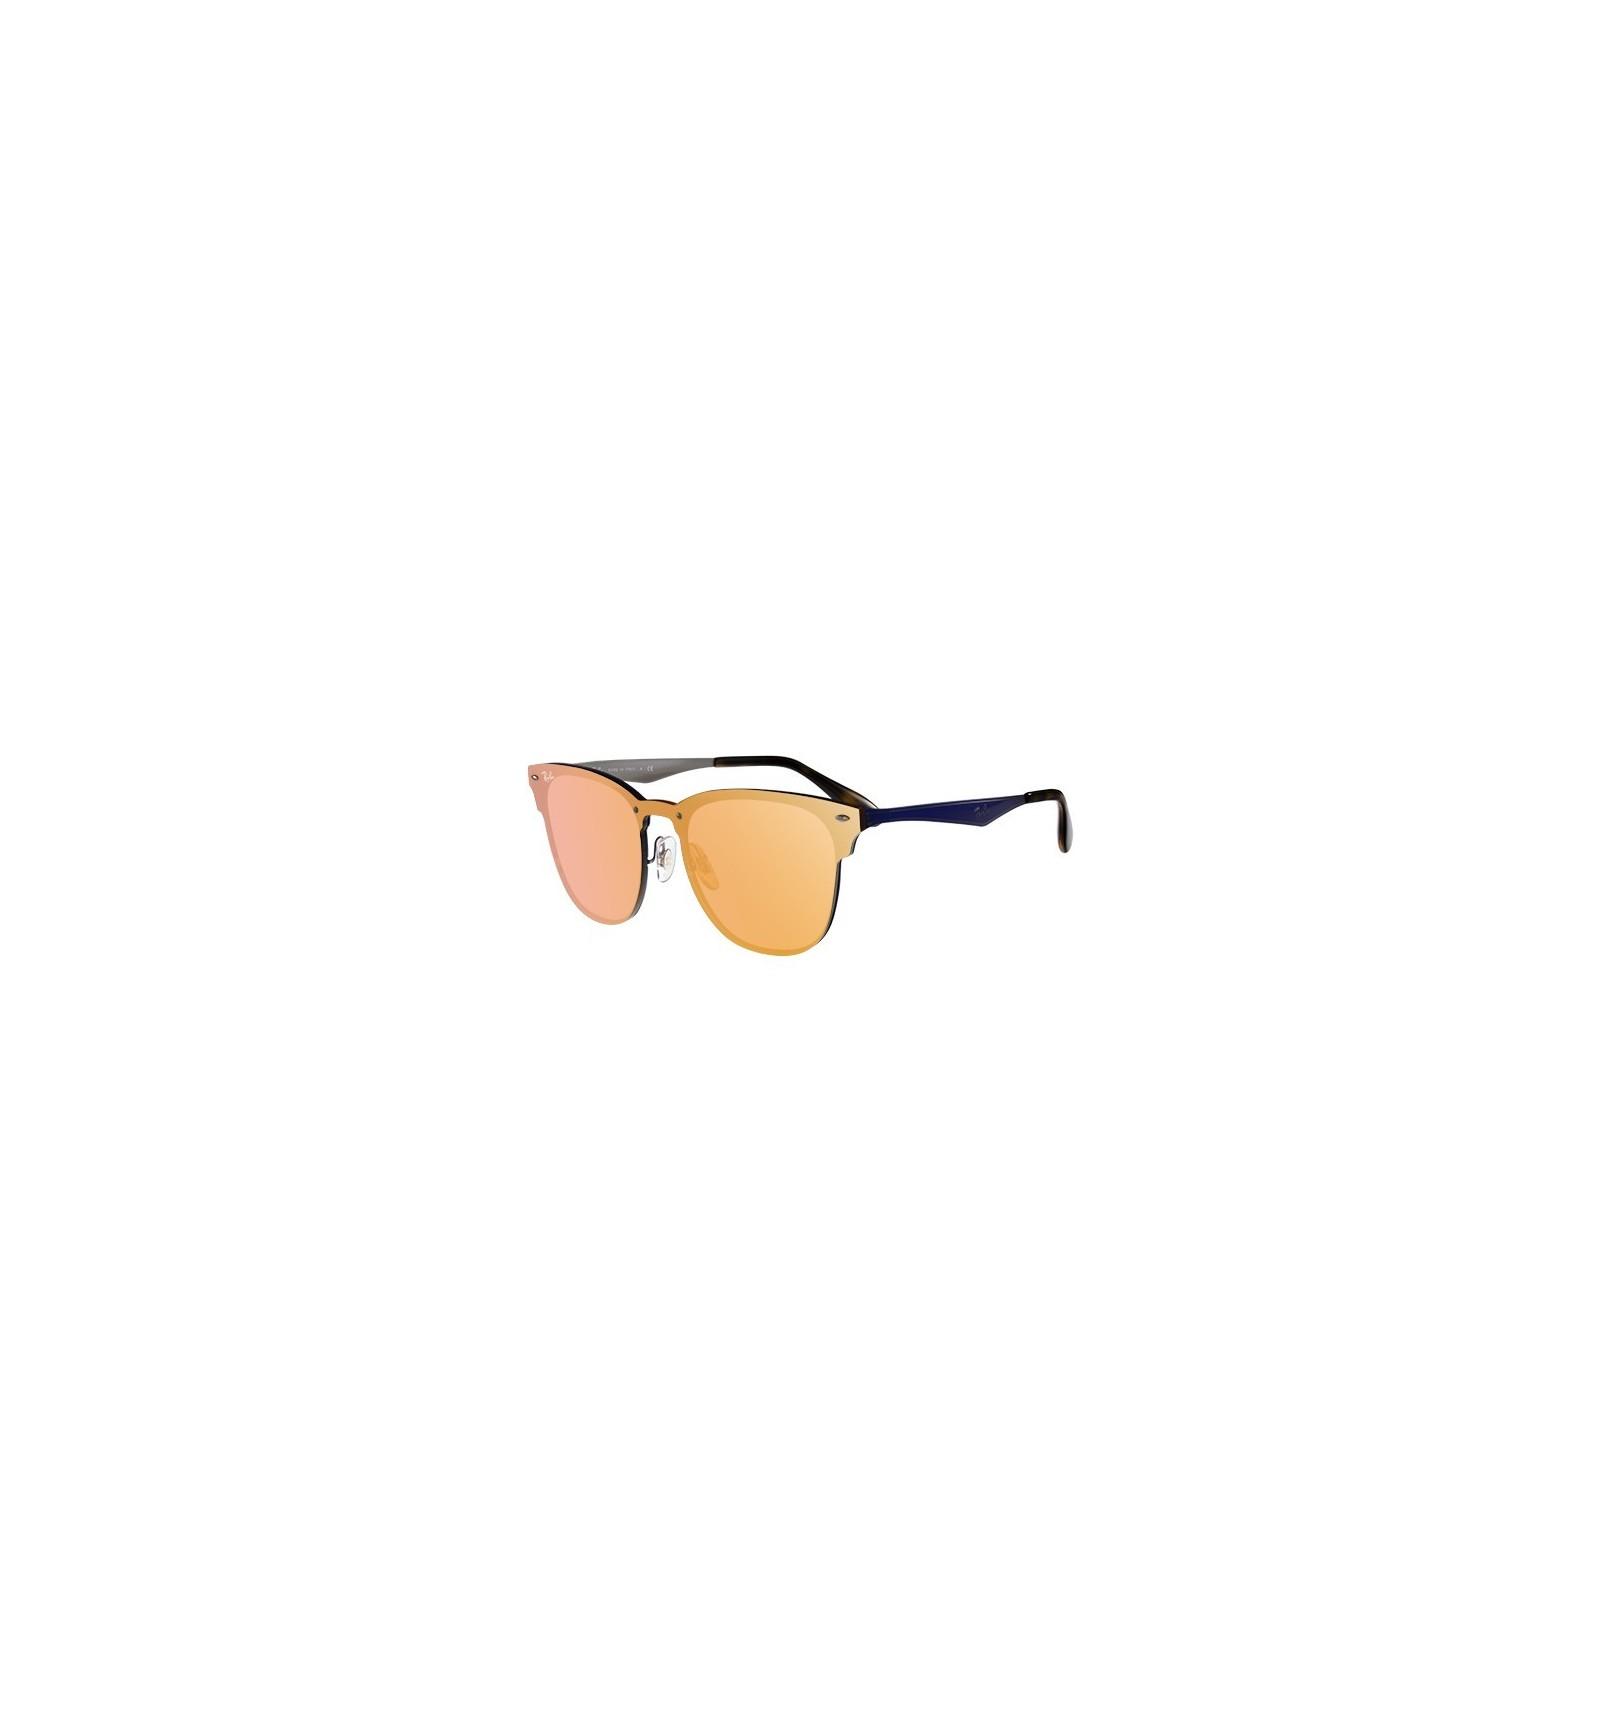 4a208696eb Gafas de sol RAY BAN RB3576 Blaze Clubmaster Blue - Orange Mirror